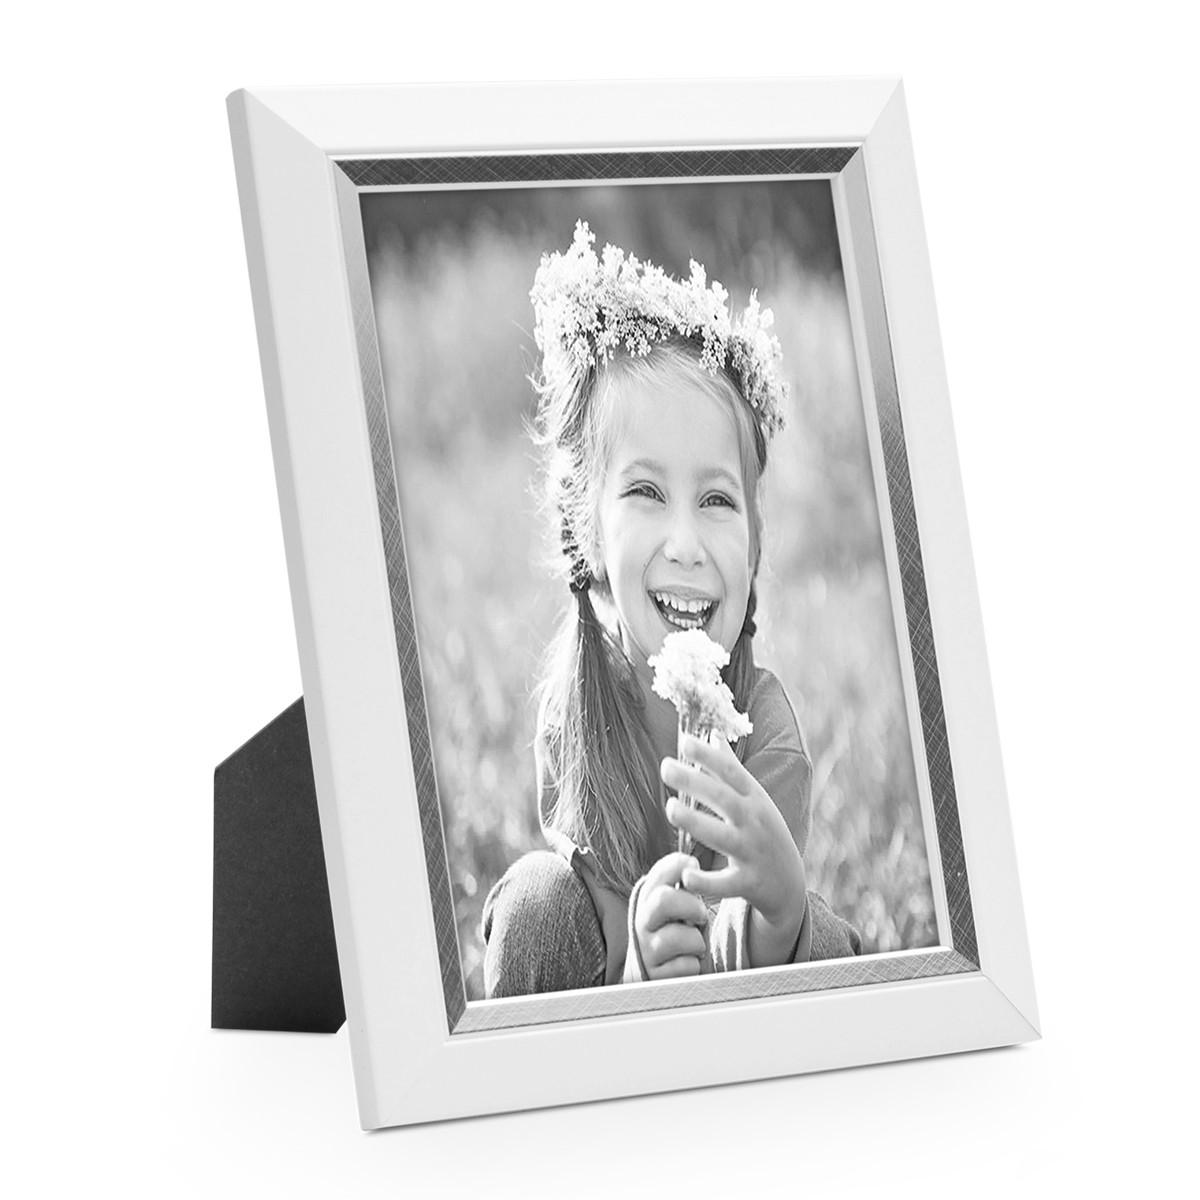 Bilderrahmen 18x24 cm Weiss Modern mit Silberkante Massivholz-Rahmen ...